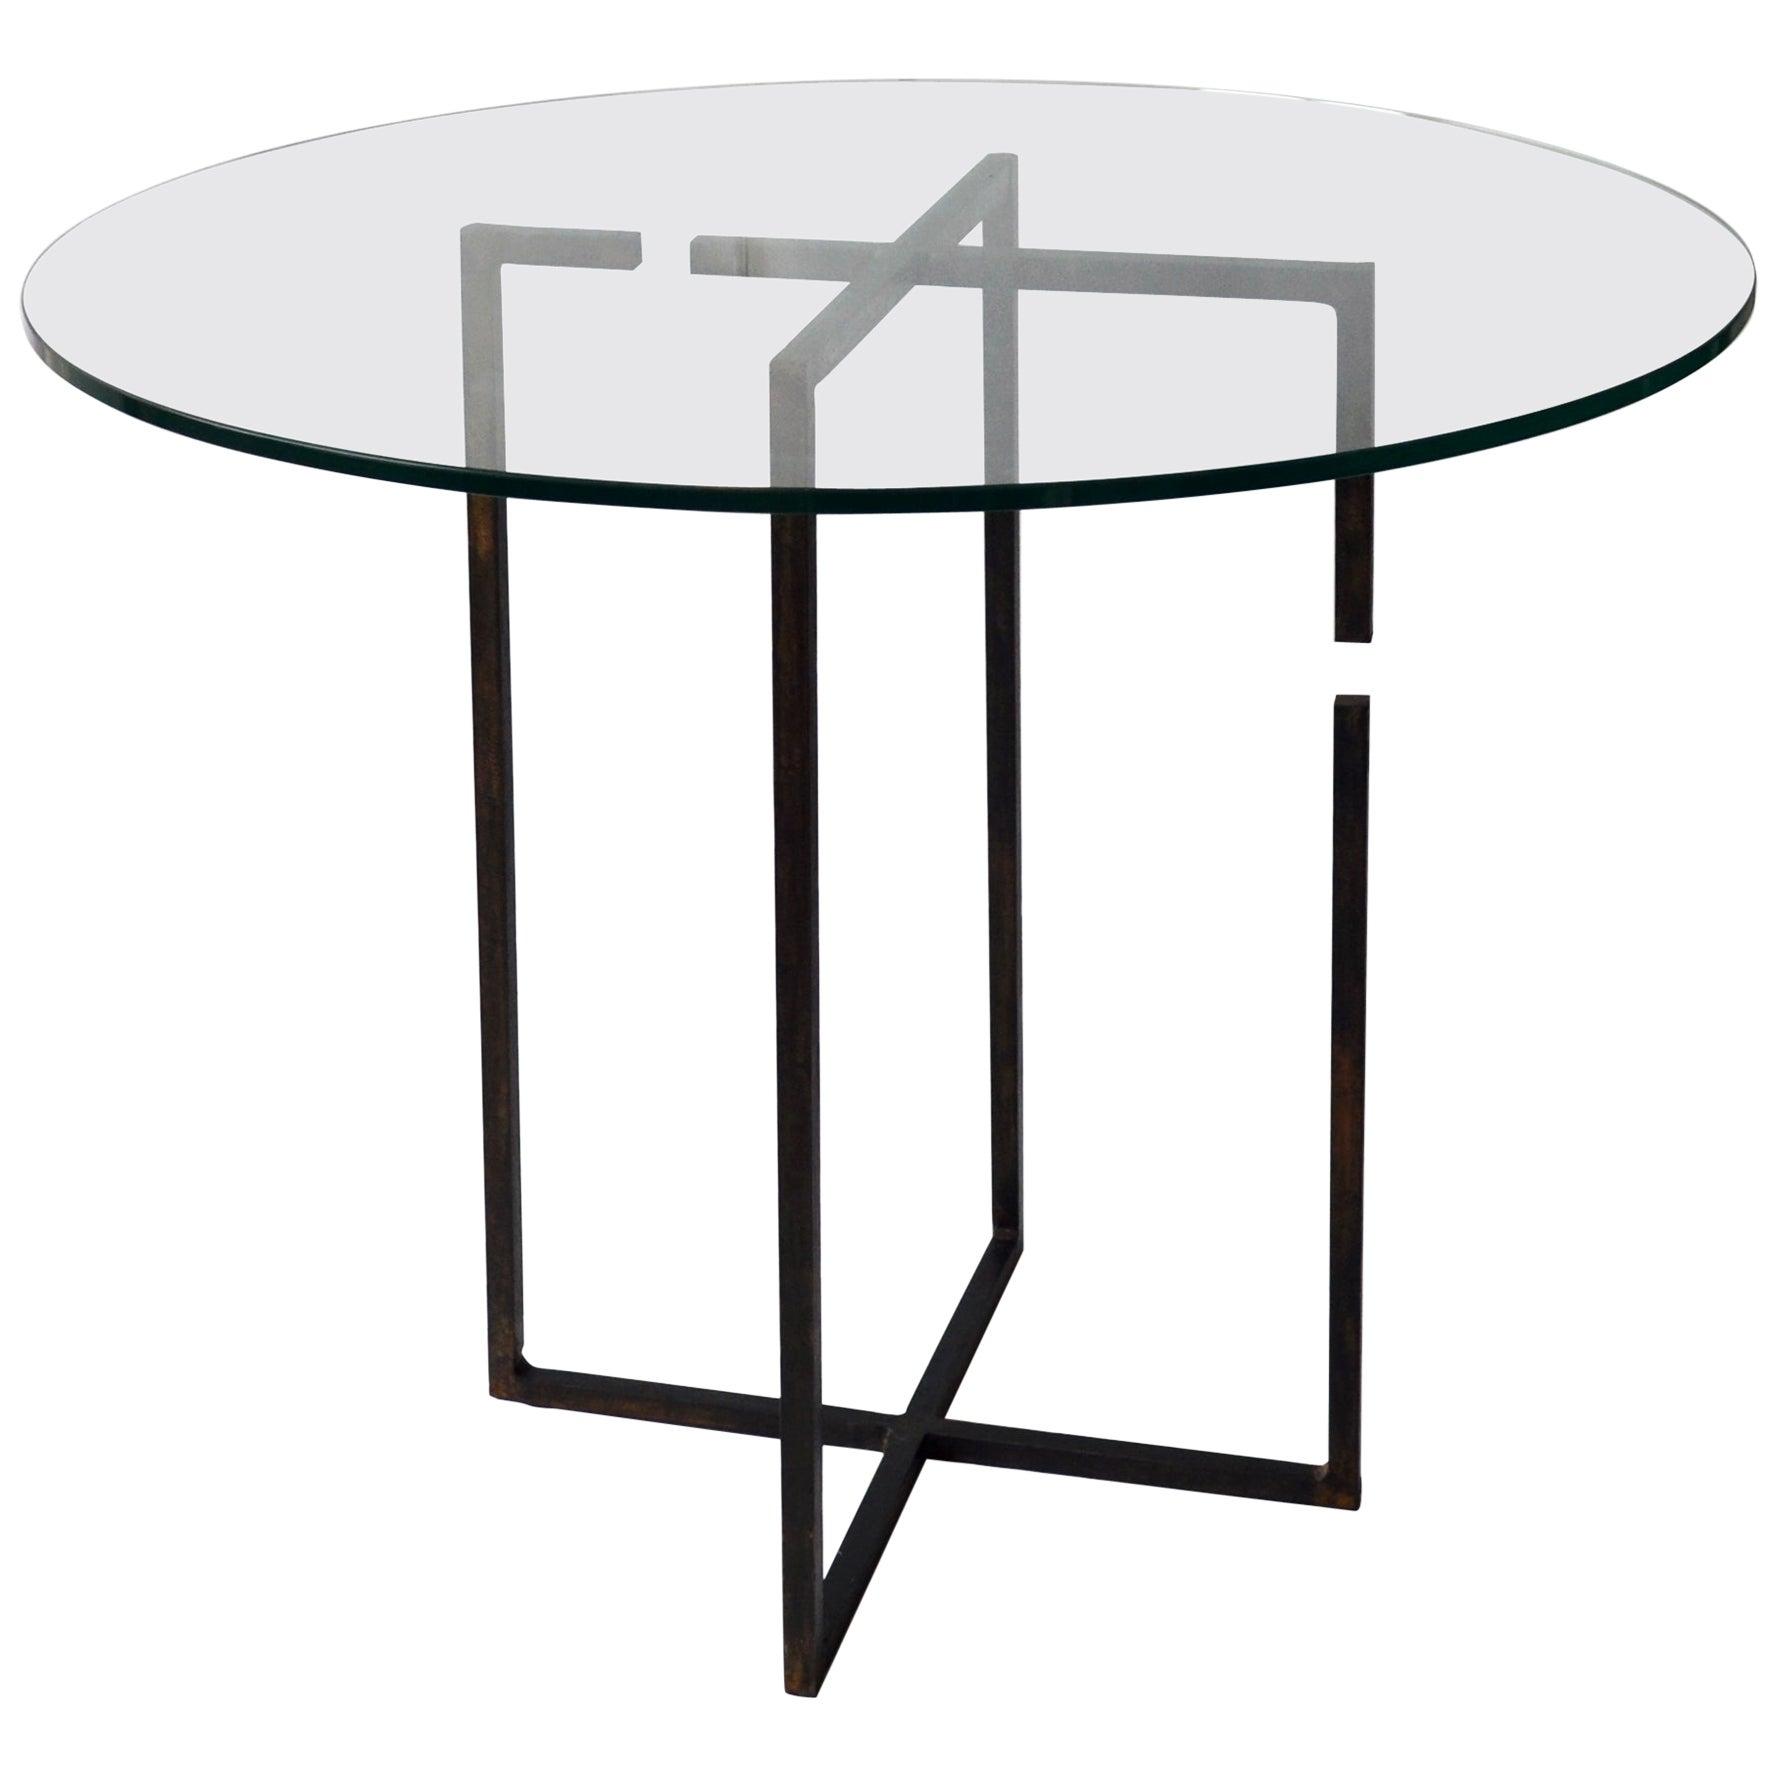 Center Table No. 4 by JM Szymanski